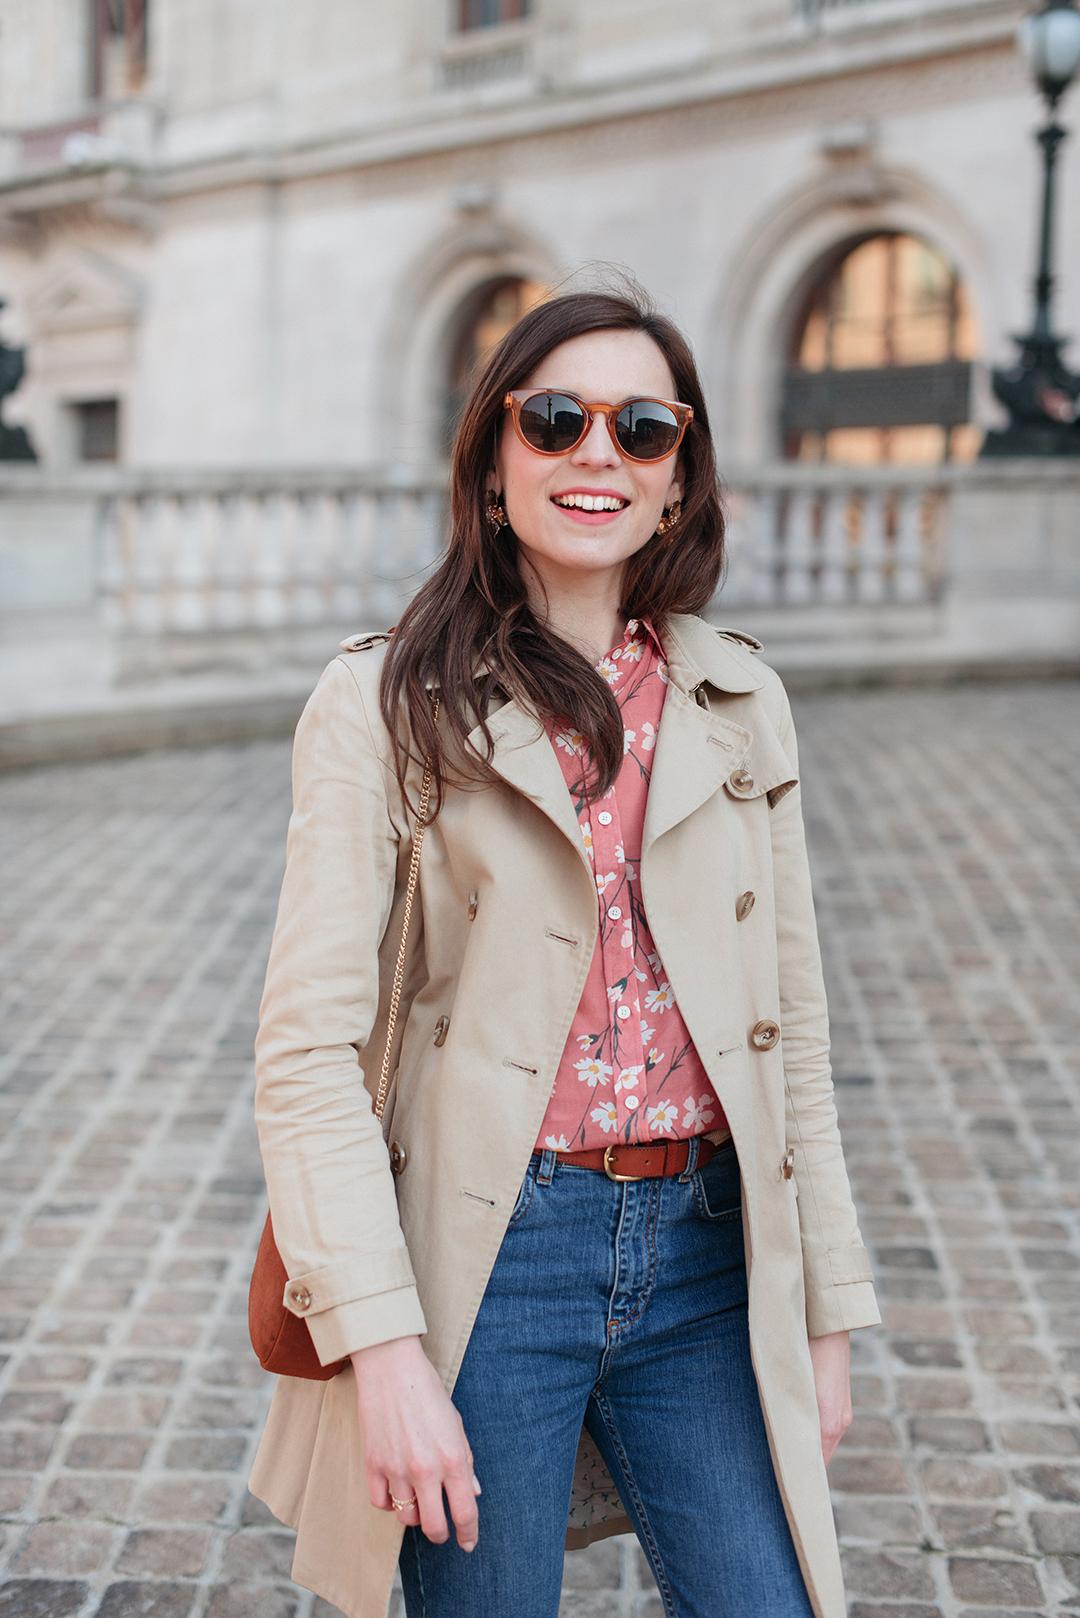 Blog-mode-And-The-City-Lifestyle-Looks-Chemisier-Fleurs-Palais-Garnier-8